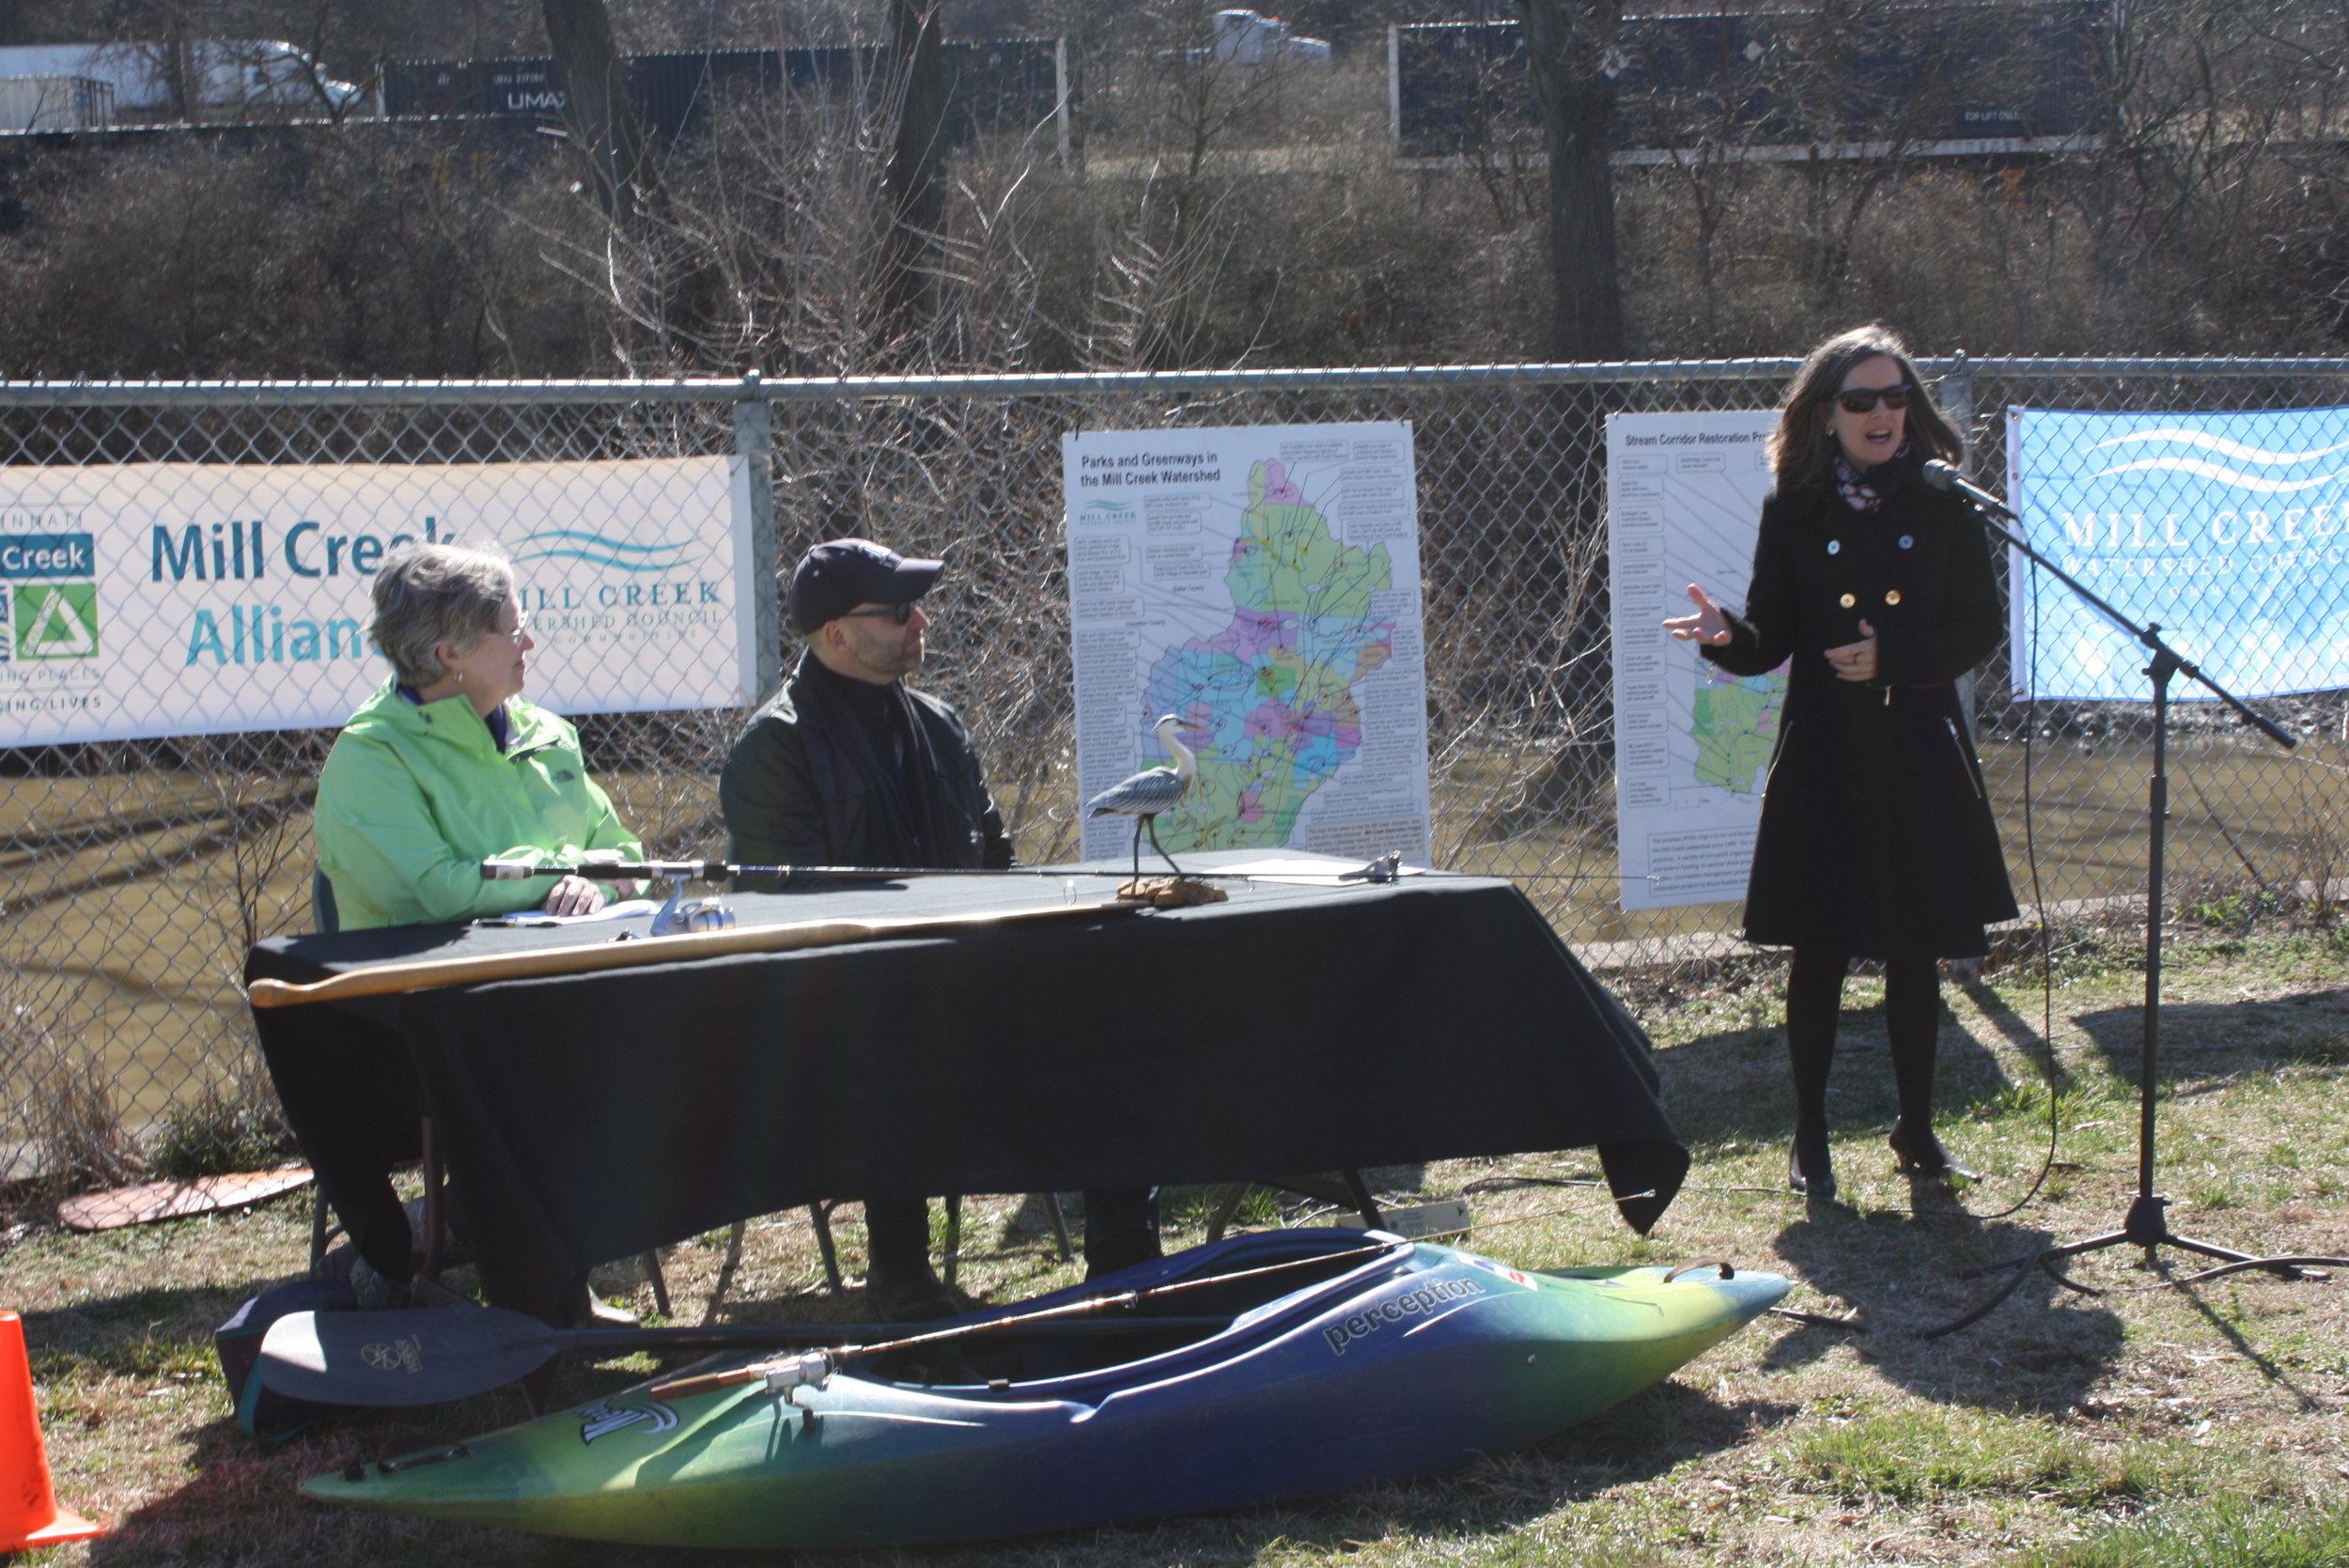 Mill Creek Alliance - press conf - Denise Driehaus at mic.JPG